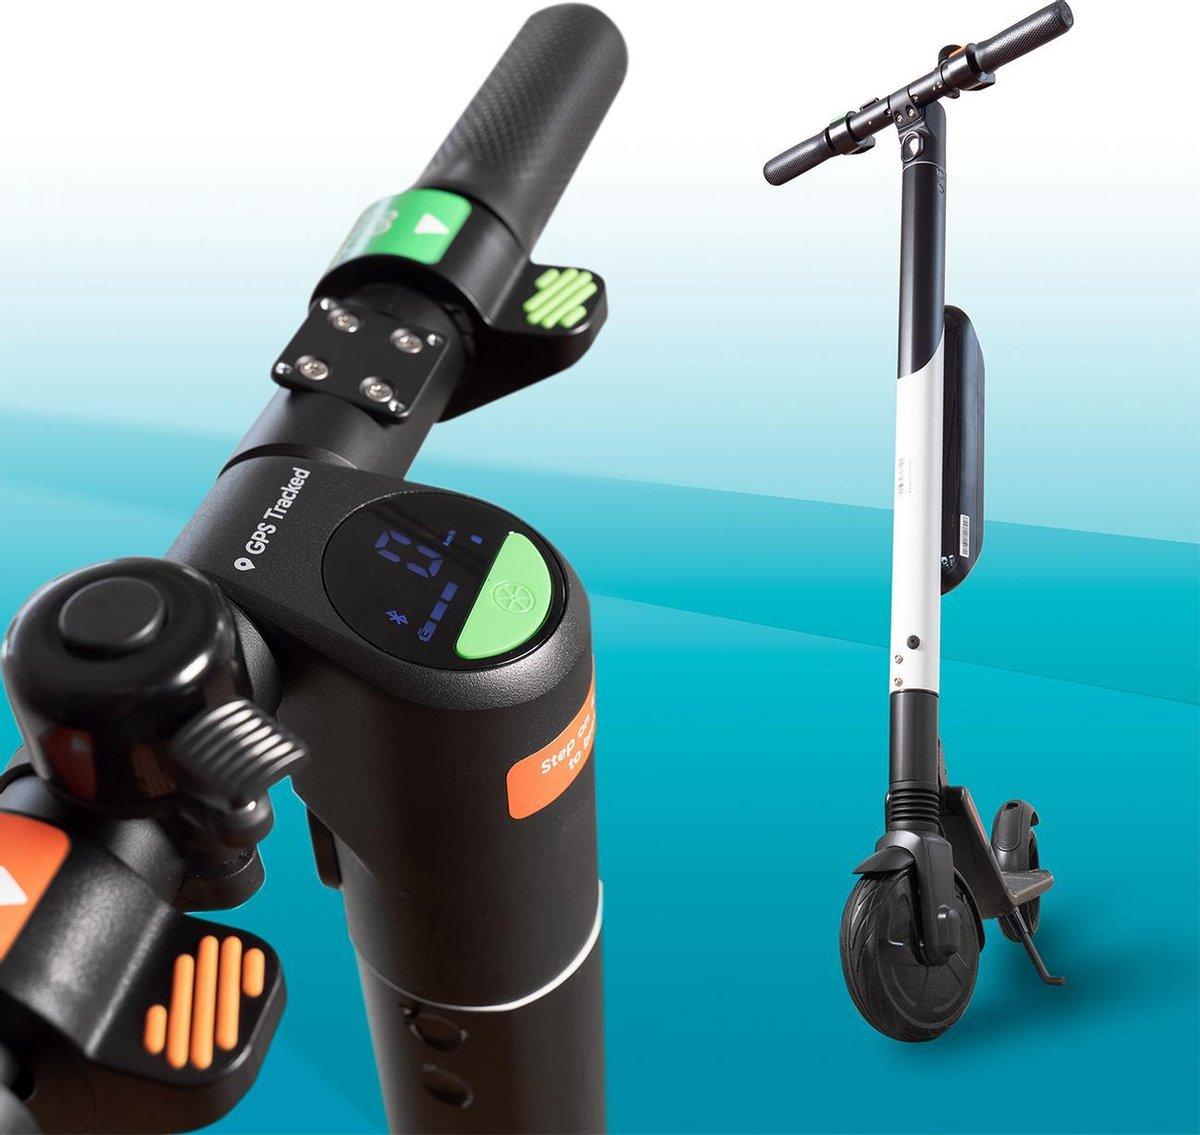 Ninebot Segway Elektrische step ES4 - E Step - E-Step - White - Non Foldable - 45 km actieradius - 27 km/u - Elektrische Step - Ninebot